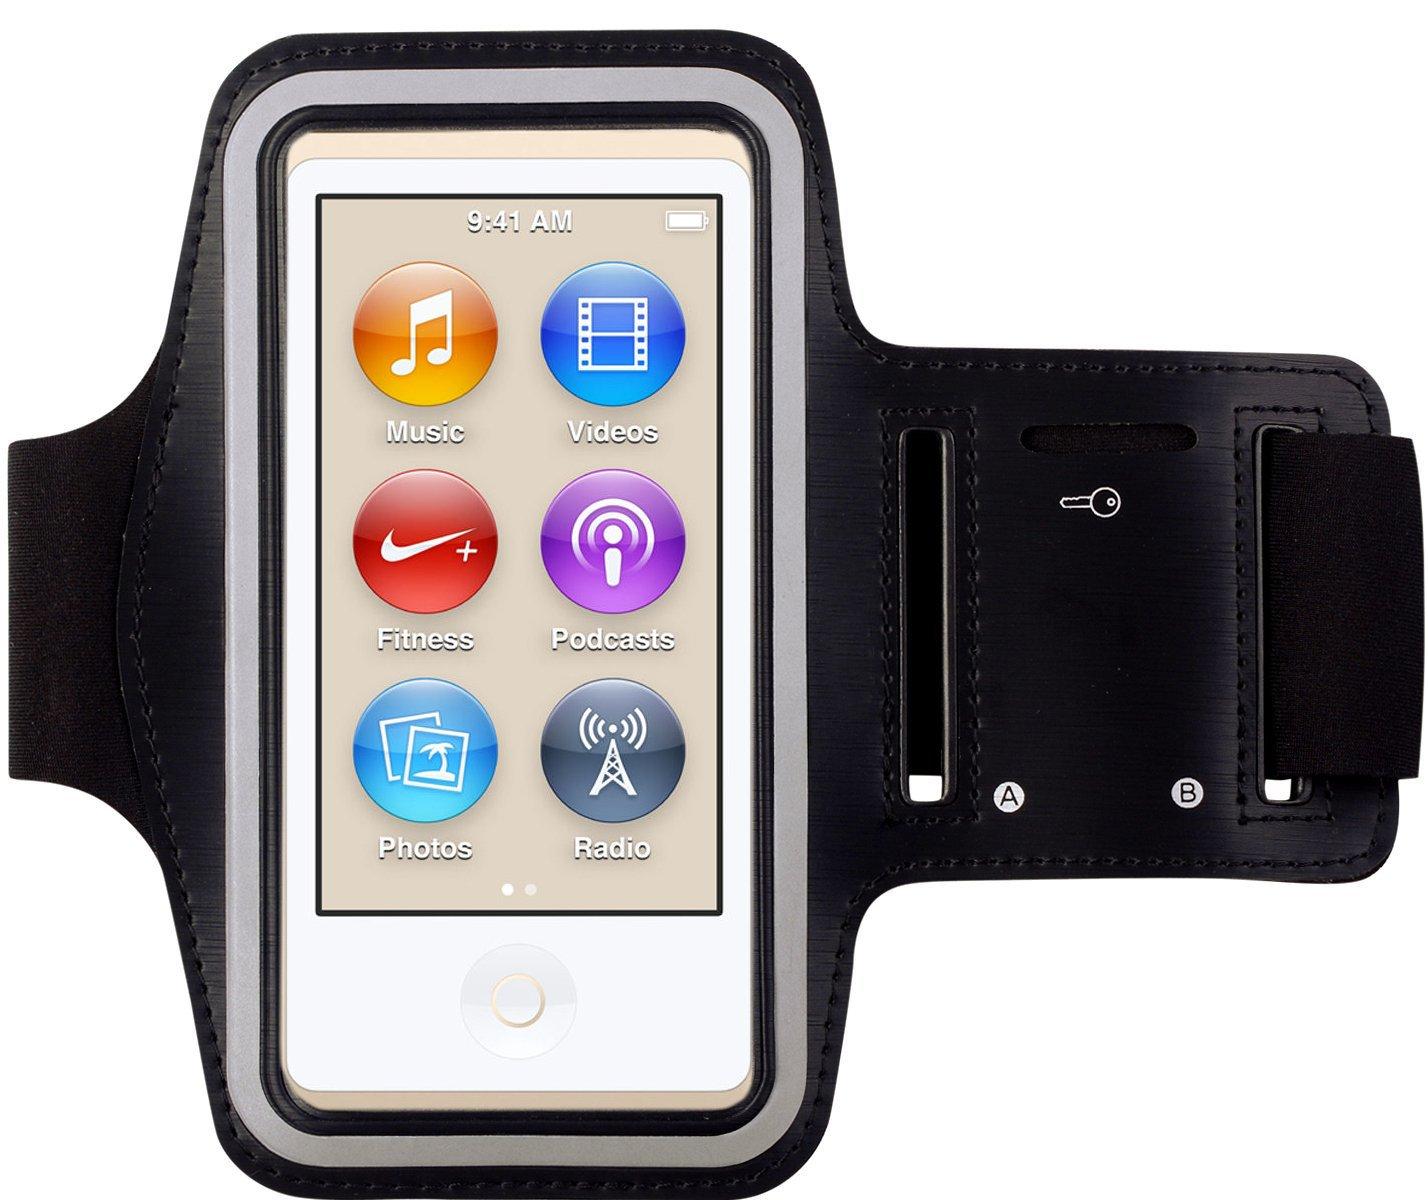 king of flash new ipod nano 7th generation premium water. Black Bedroom Furniture Sets. Home Design Ideas